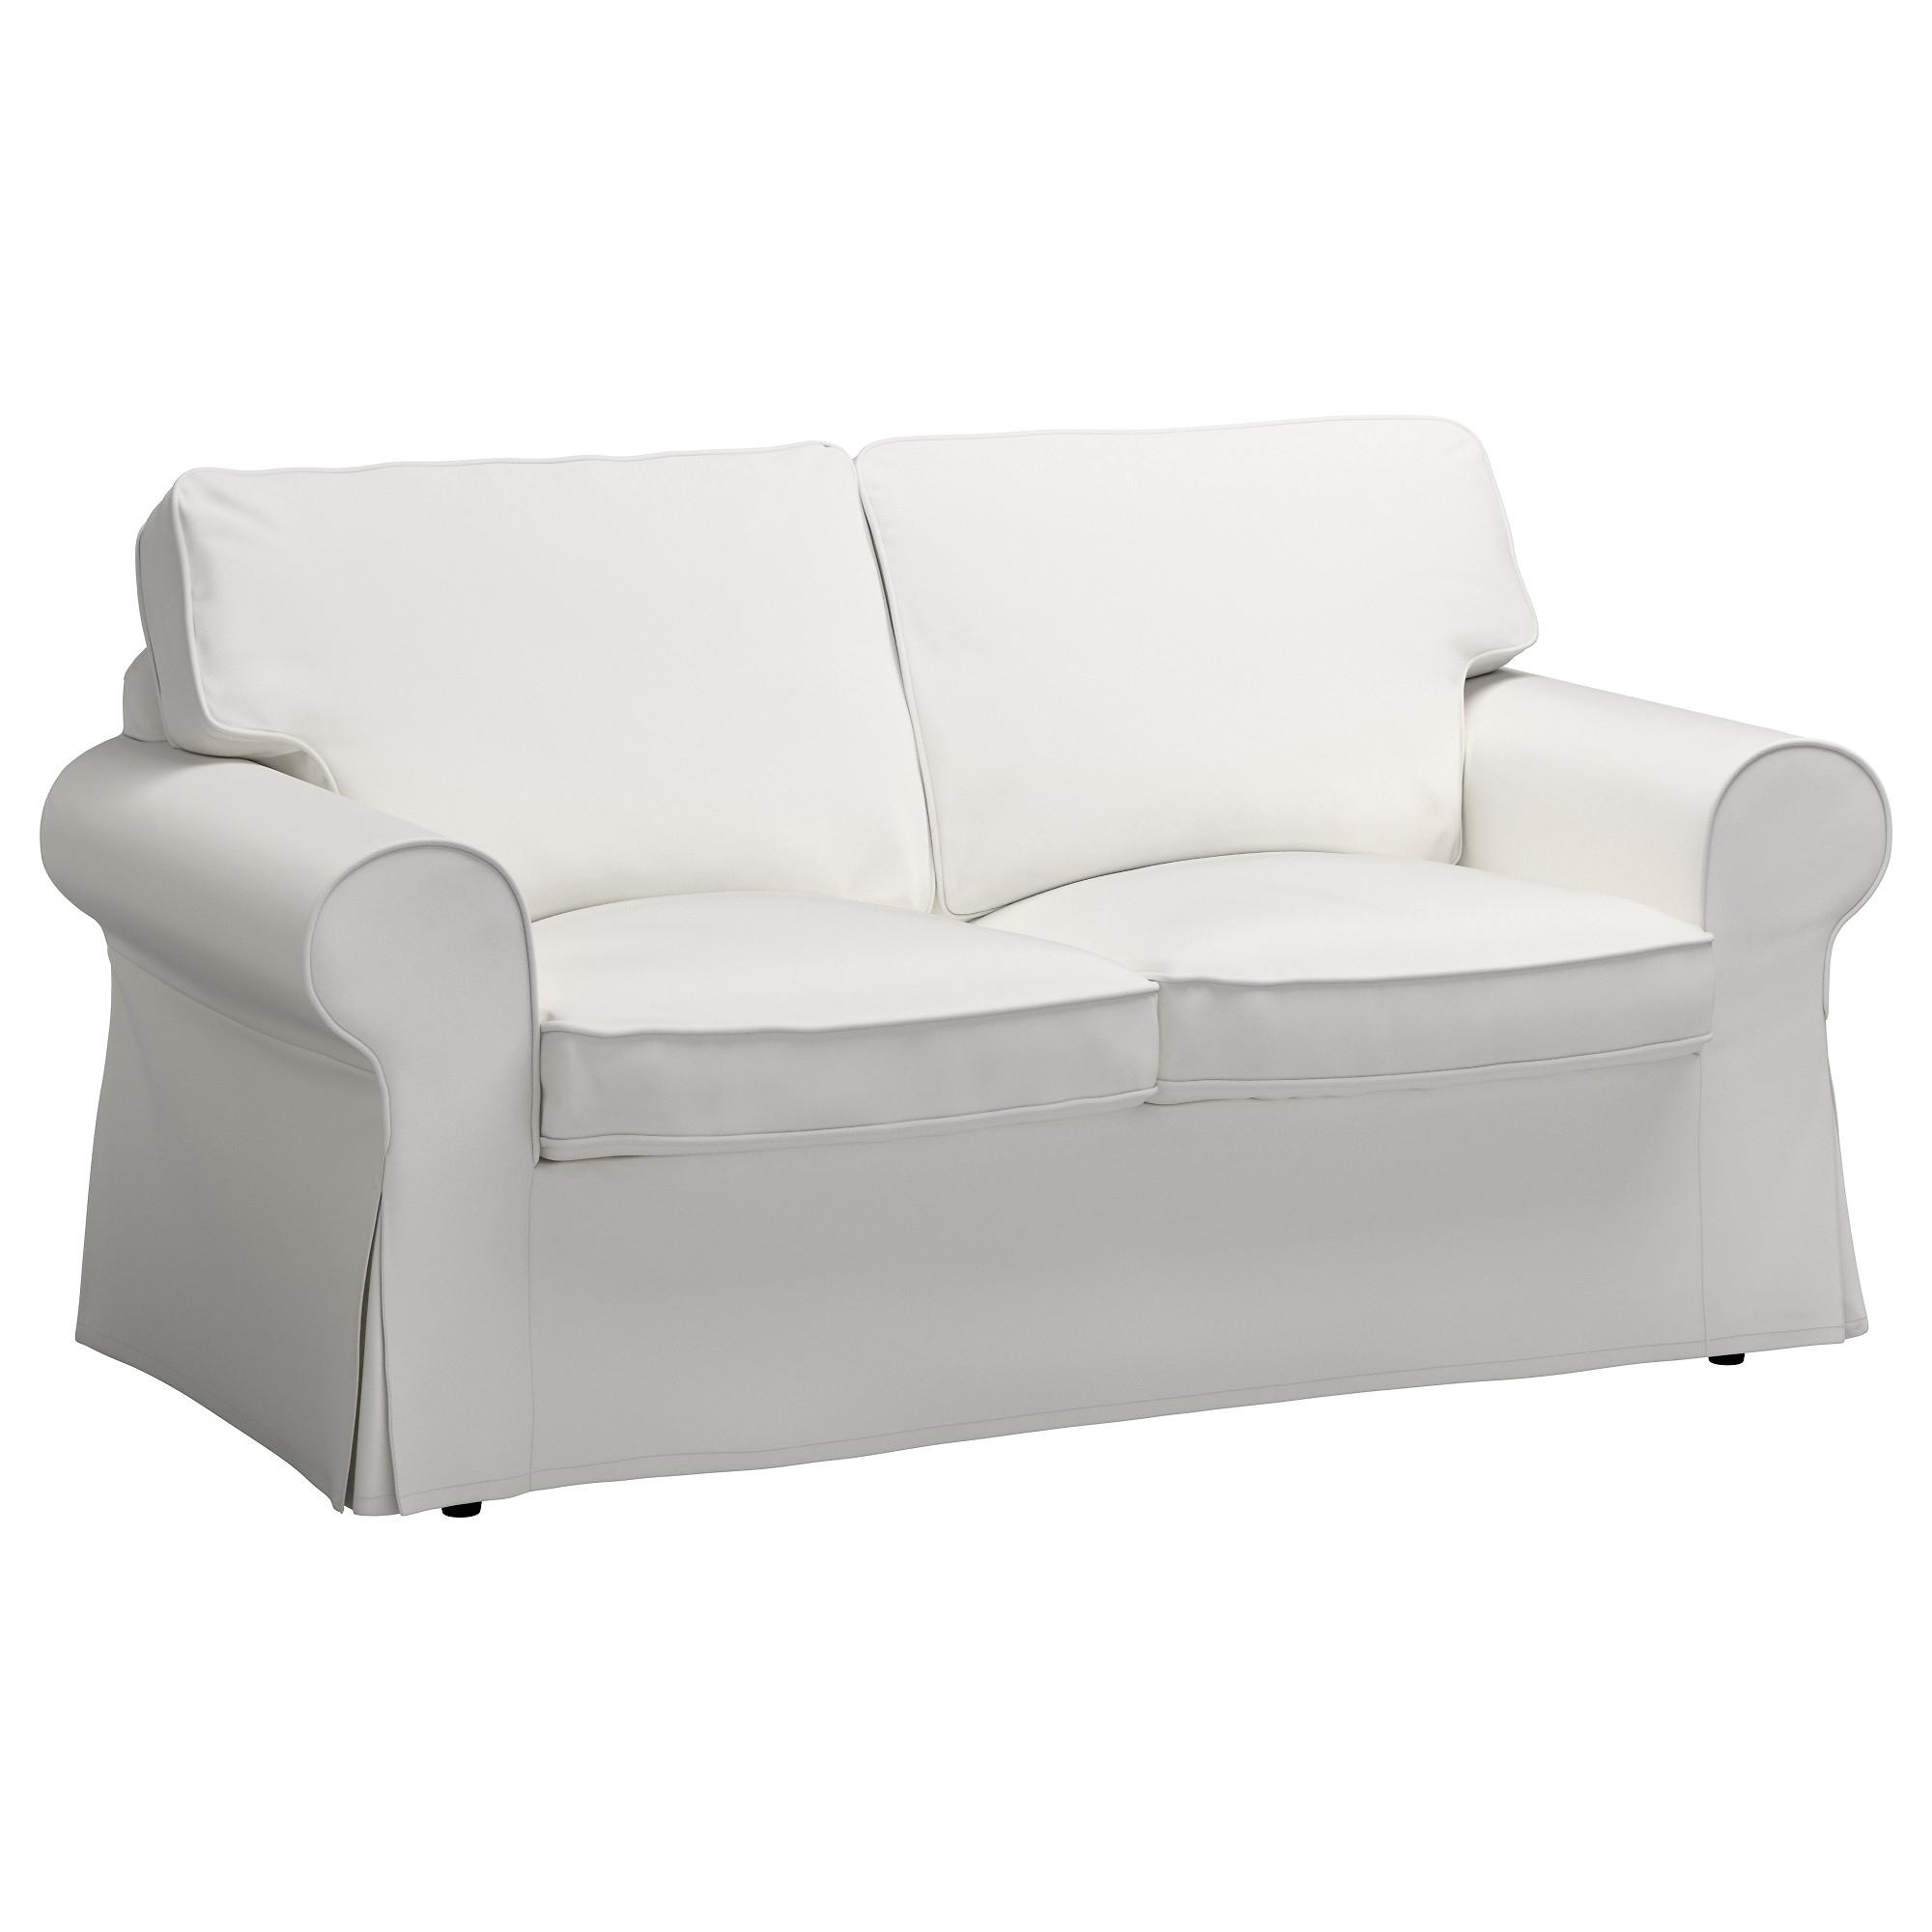 Trendy Ektorp Loveseat – Vittaryd White – Ikea Regarding Ikea Loveseat Sleeper Sofas (View 15 of 15)